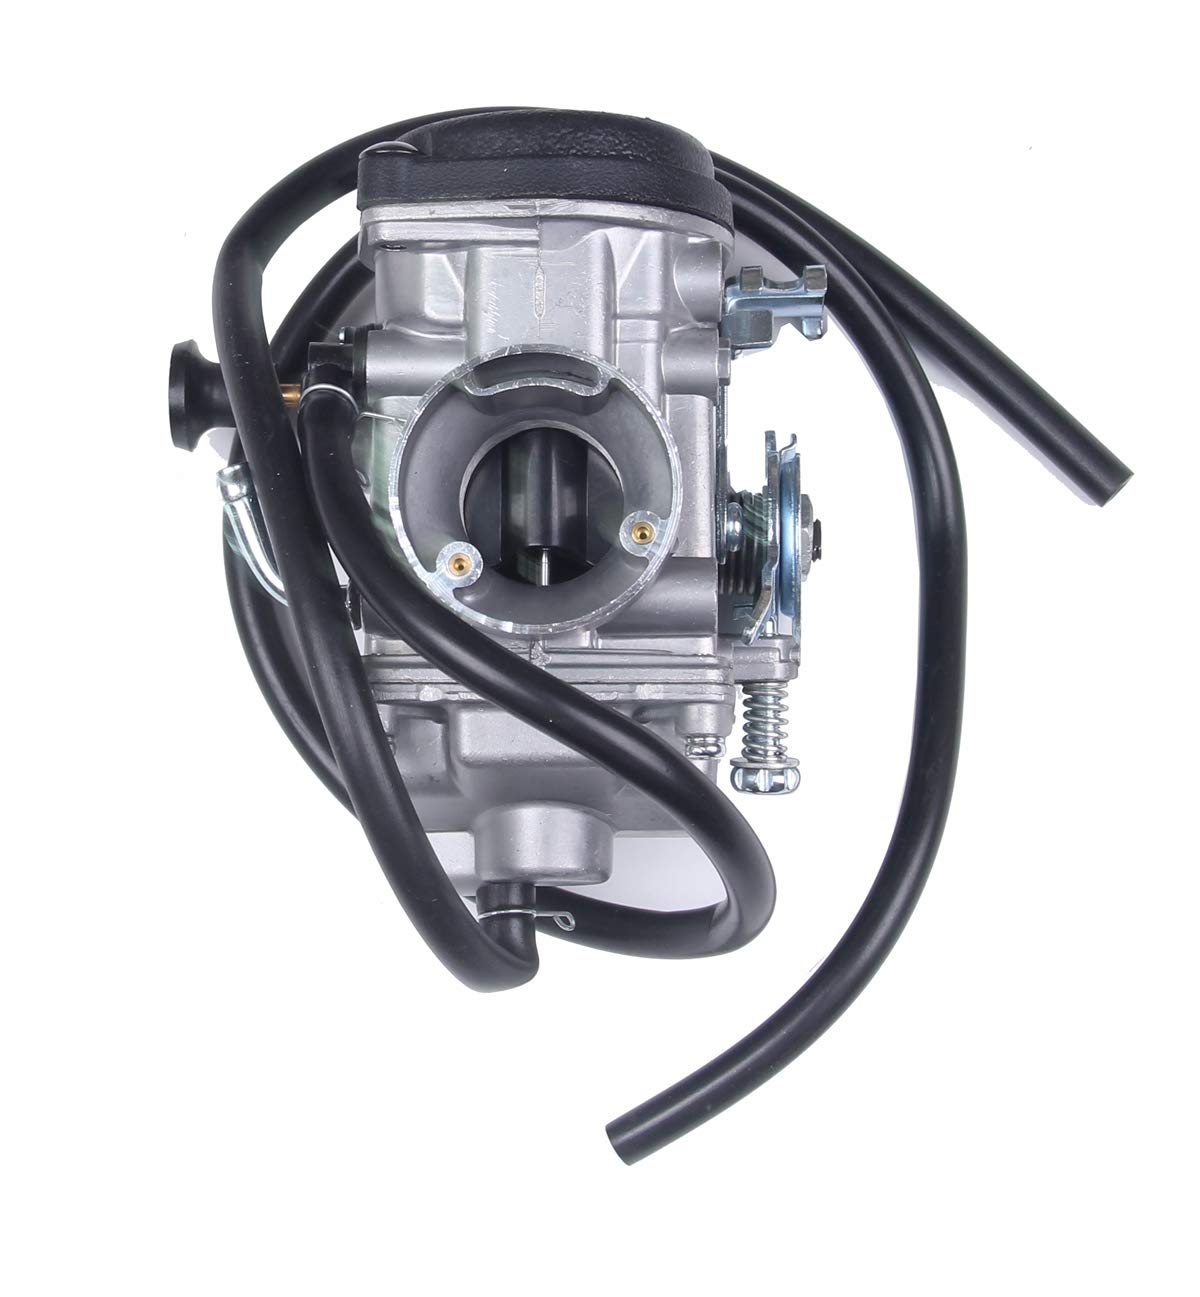 New Carburetor For Yamaha TW 125 5RS-14301-00-00 TEIKEI MV 28